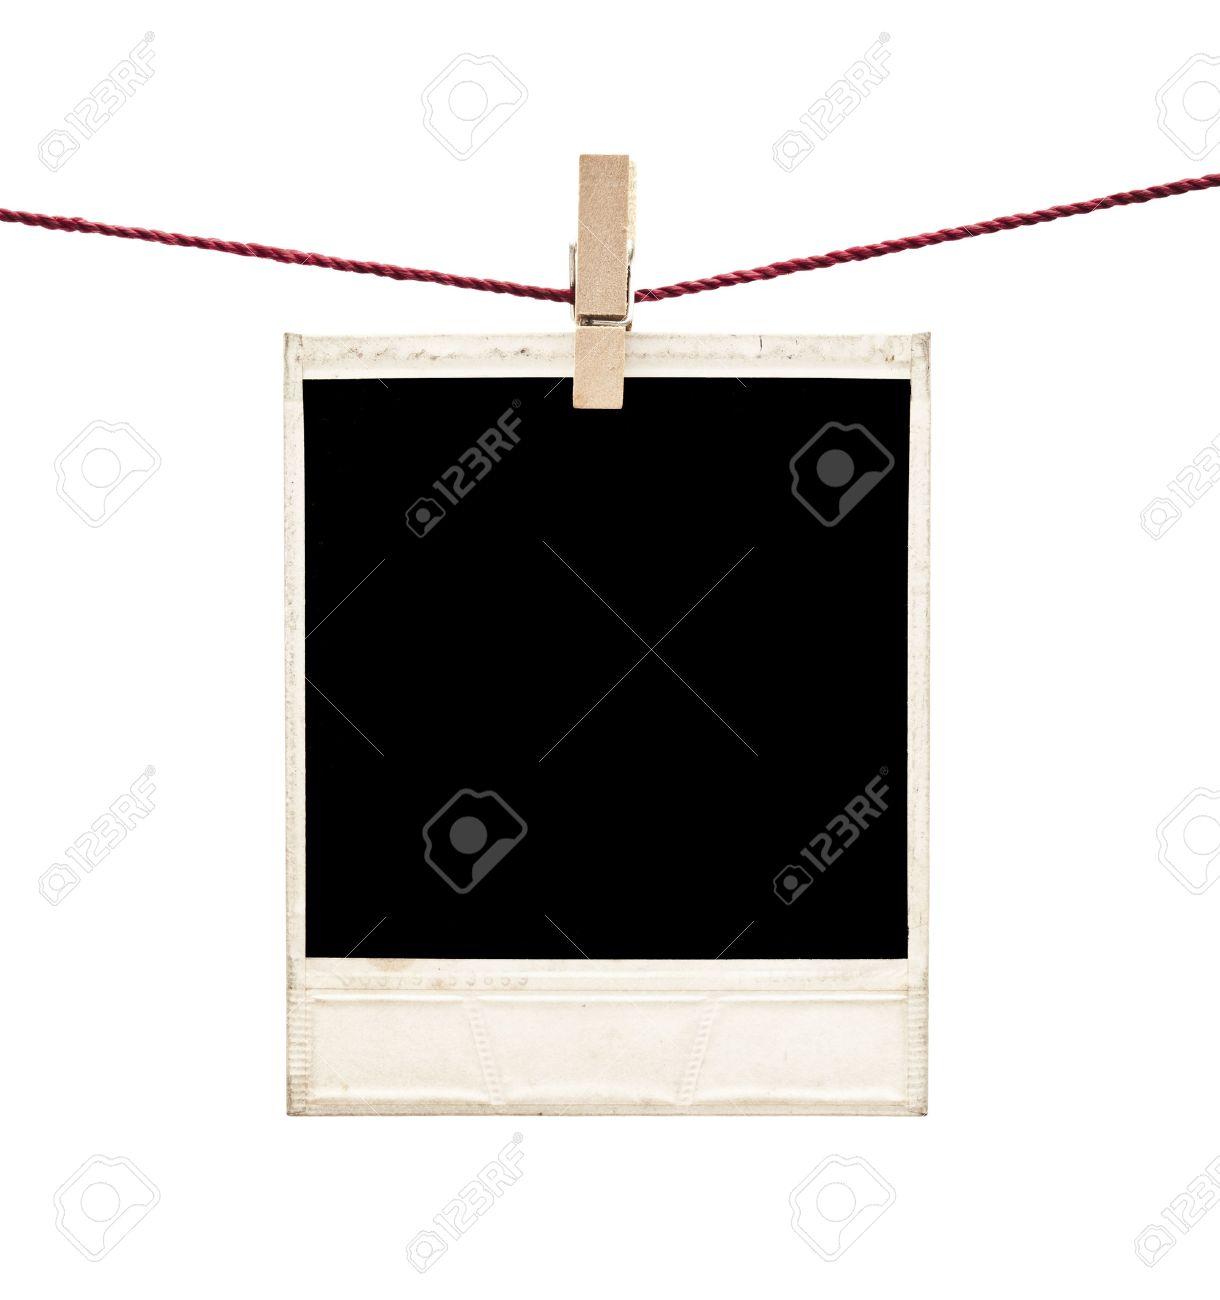 Photo Polaroid Frames On White Stock Photo, Picture And Royalty Free ...